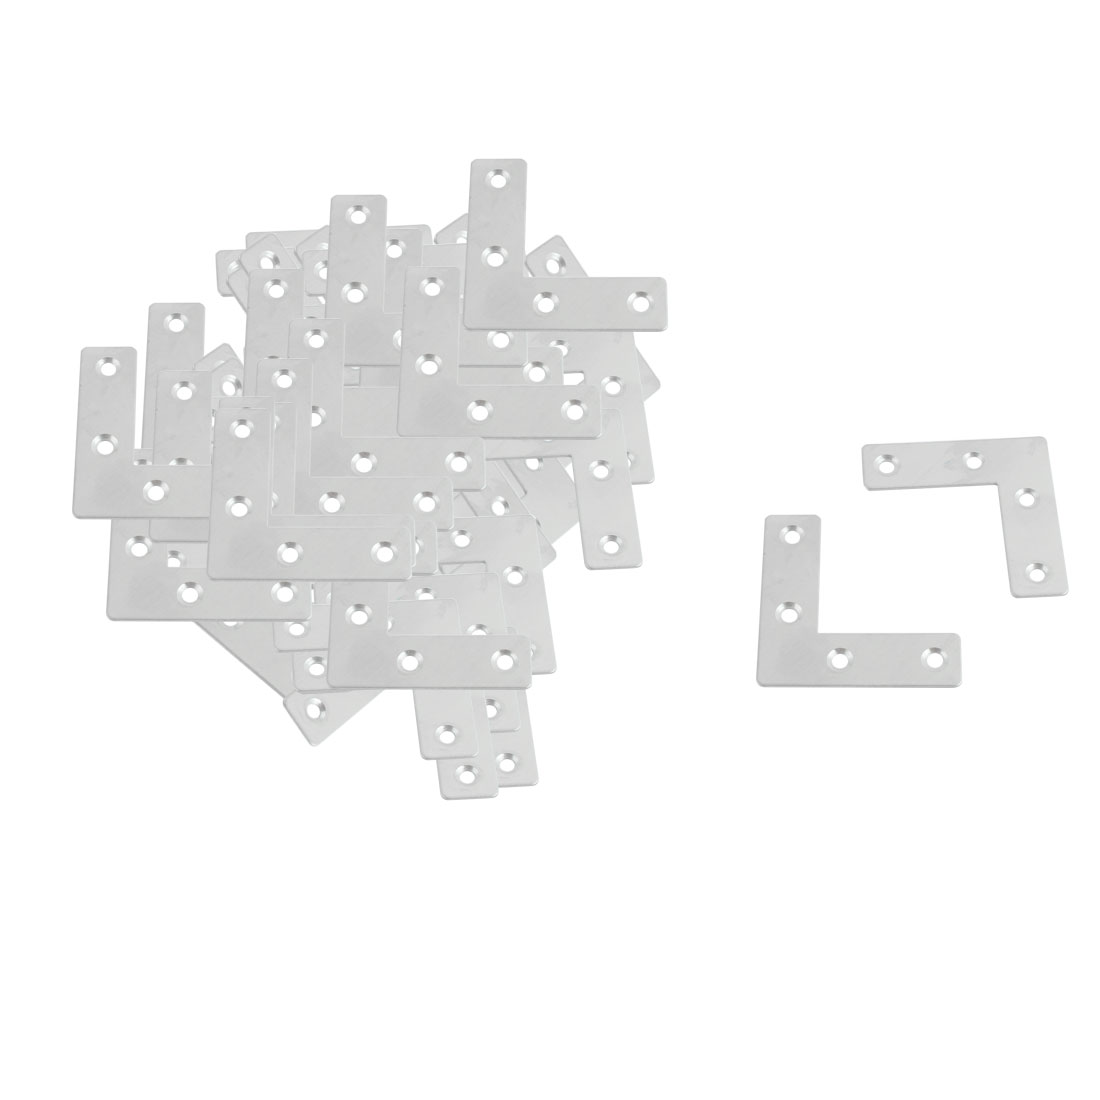 50 Pcs 50mm x 50mm Stainless Steel Angle Plate Corner Brace Flat L Shape Repair Bracket